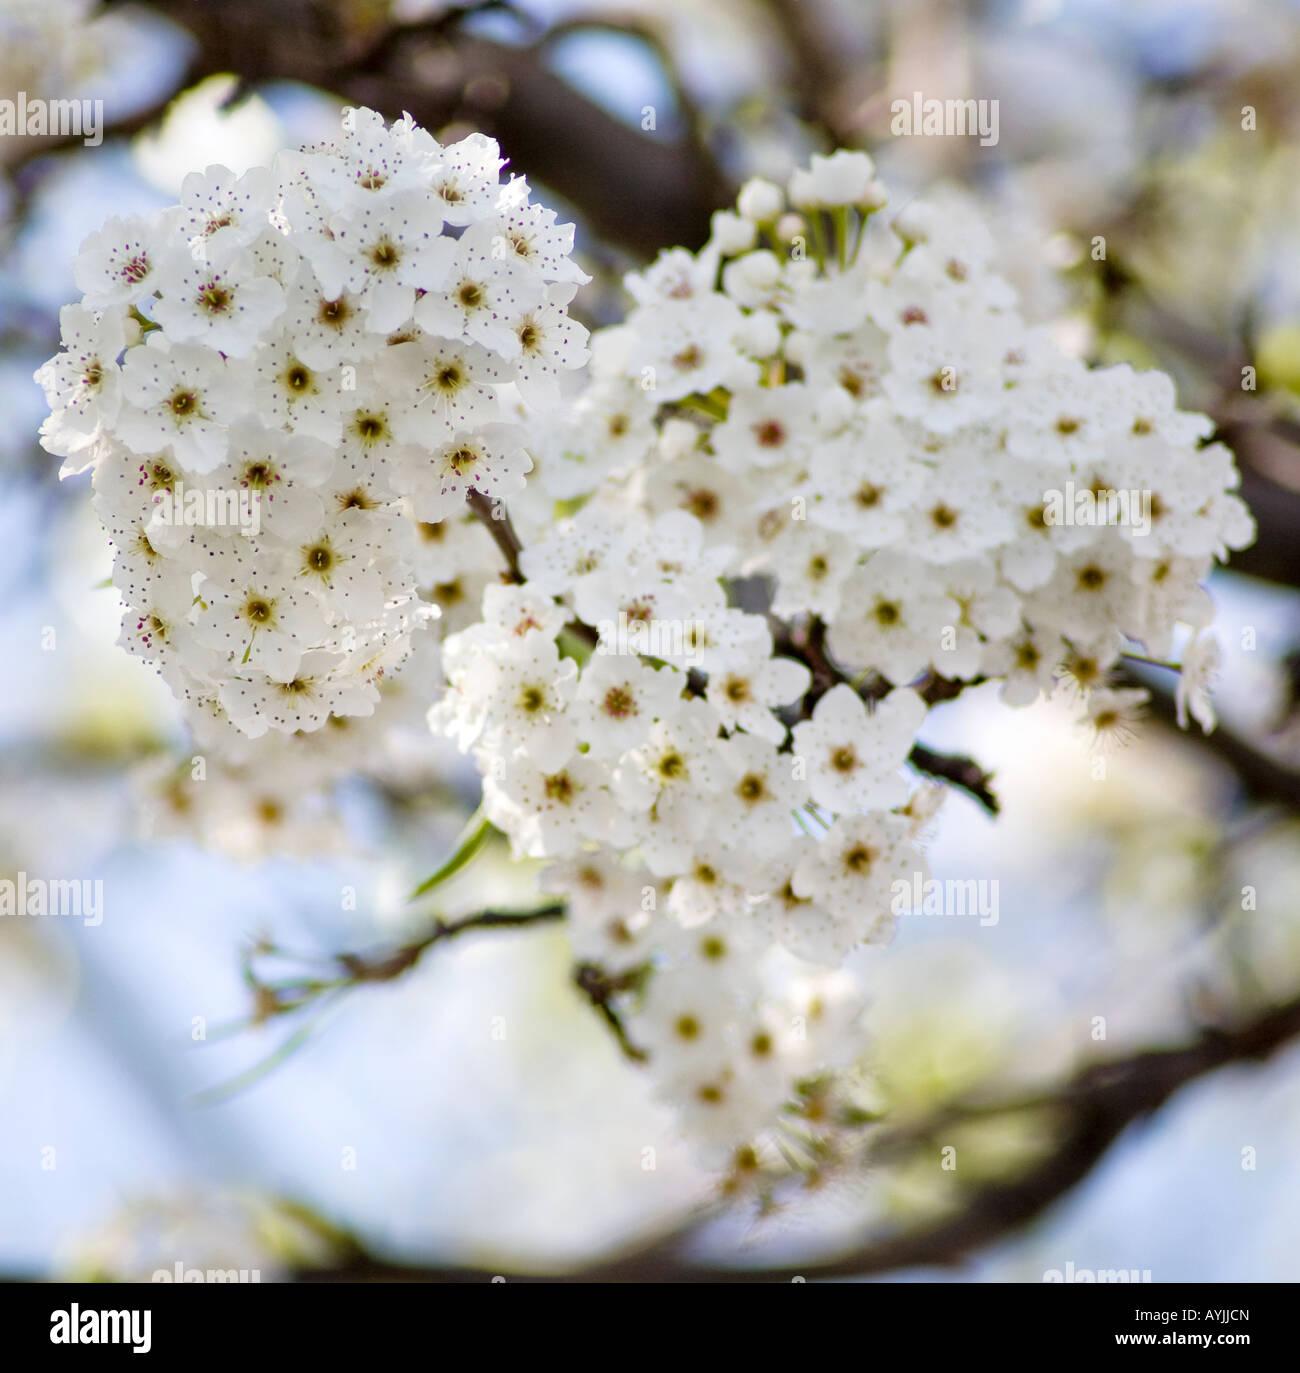 Pyrus Calleryana, Aristocrat Pear tree flowering buds closeup. - Stock Image